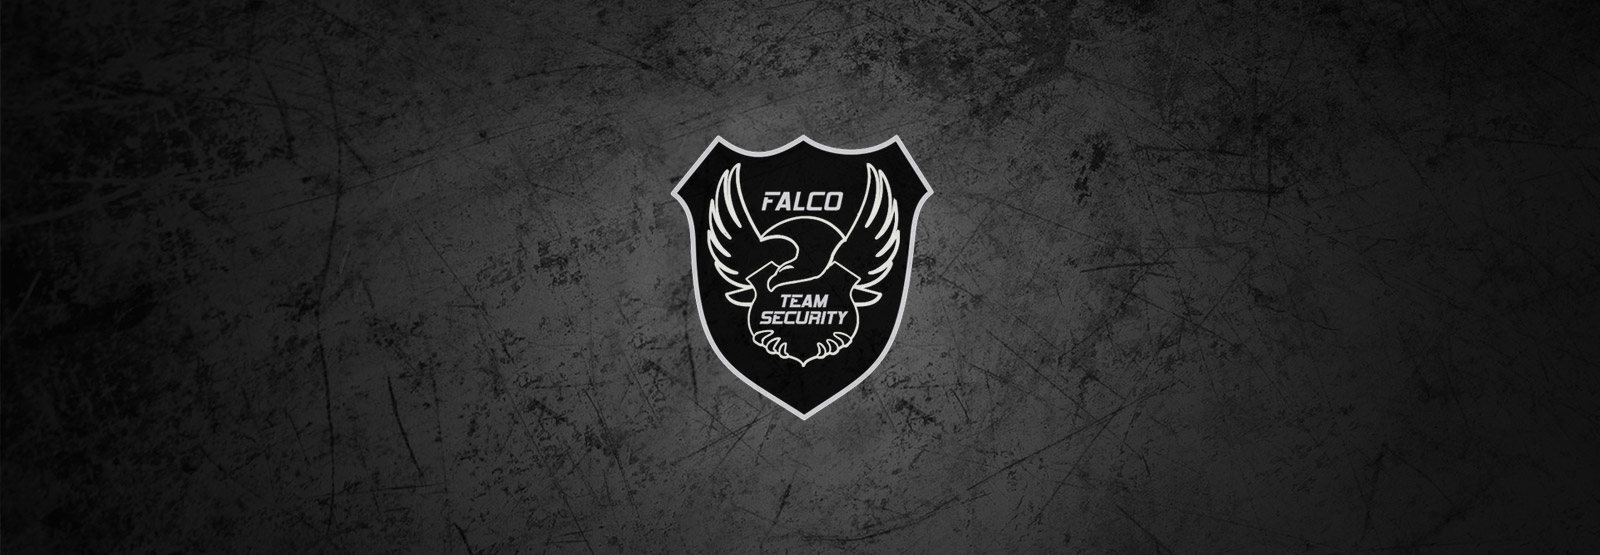 falco_logo_banner_homepage4